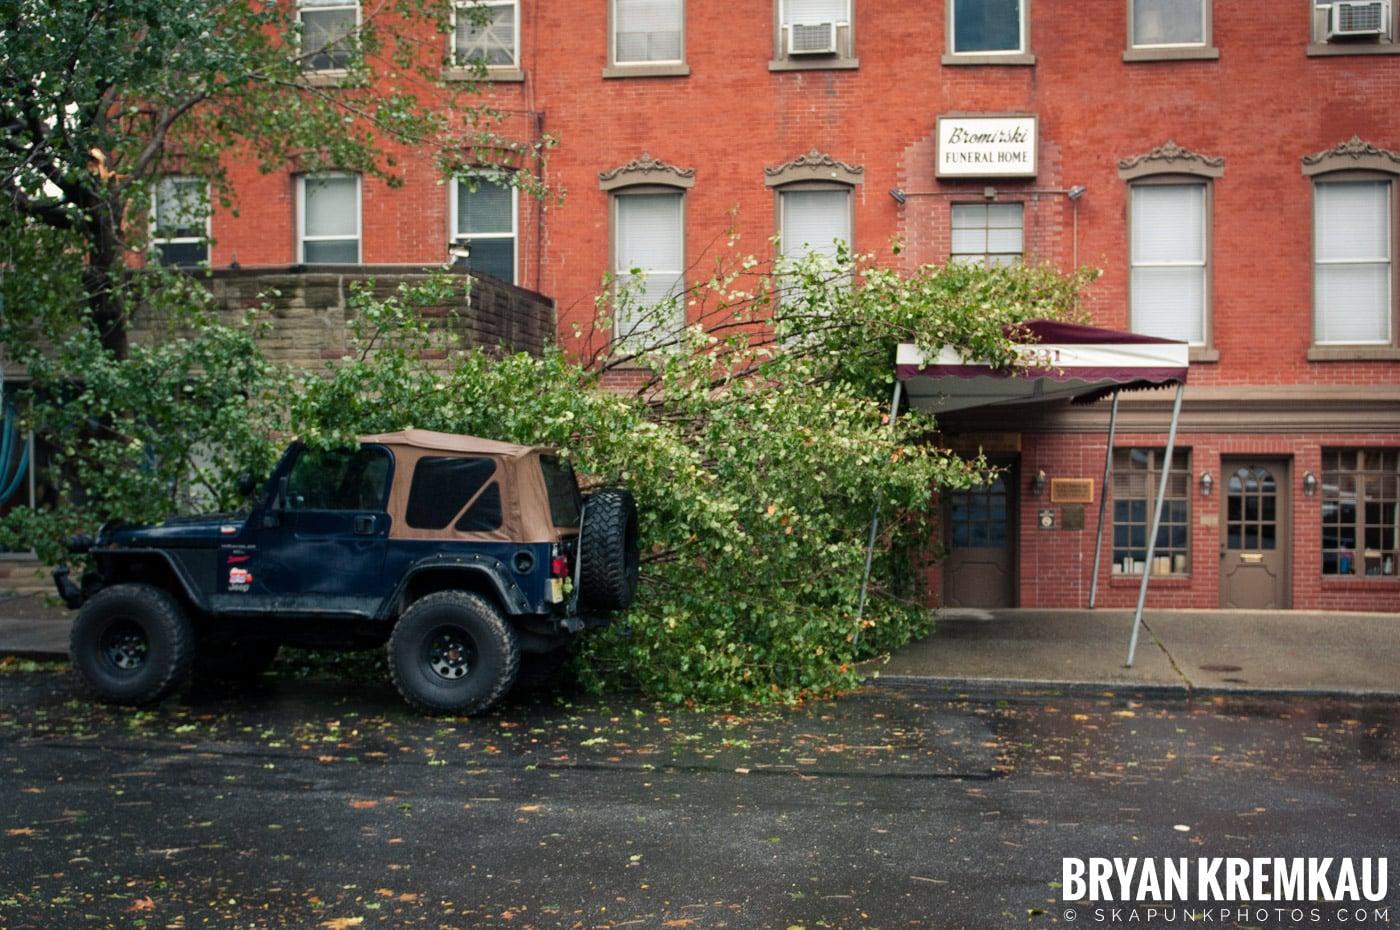 Hurricane Sandy 2012 @ Paulus Hook, Jersey City - 10.29.12 - 10.30.12 (33)